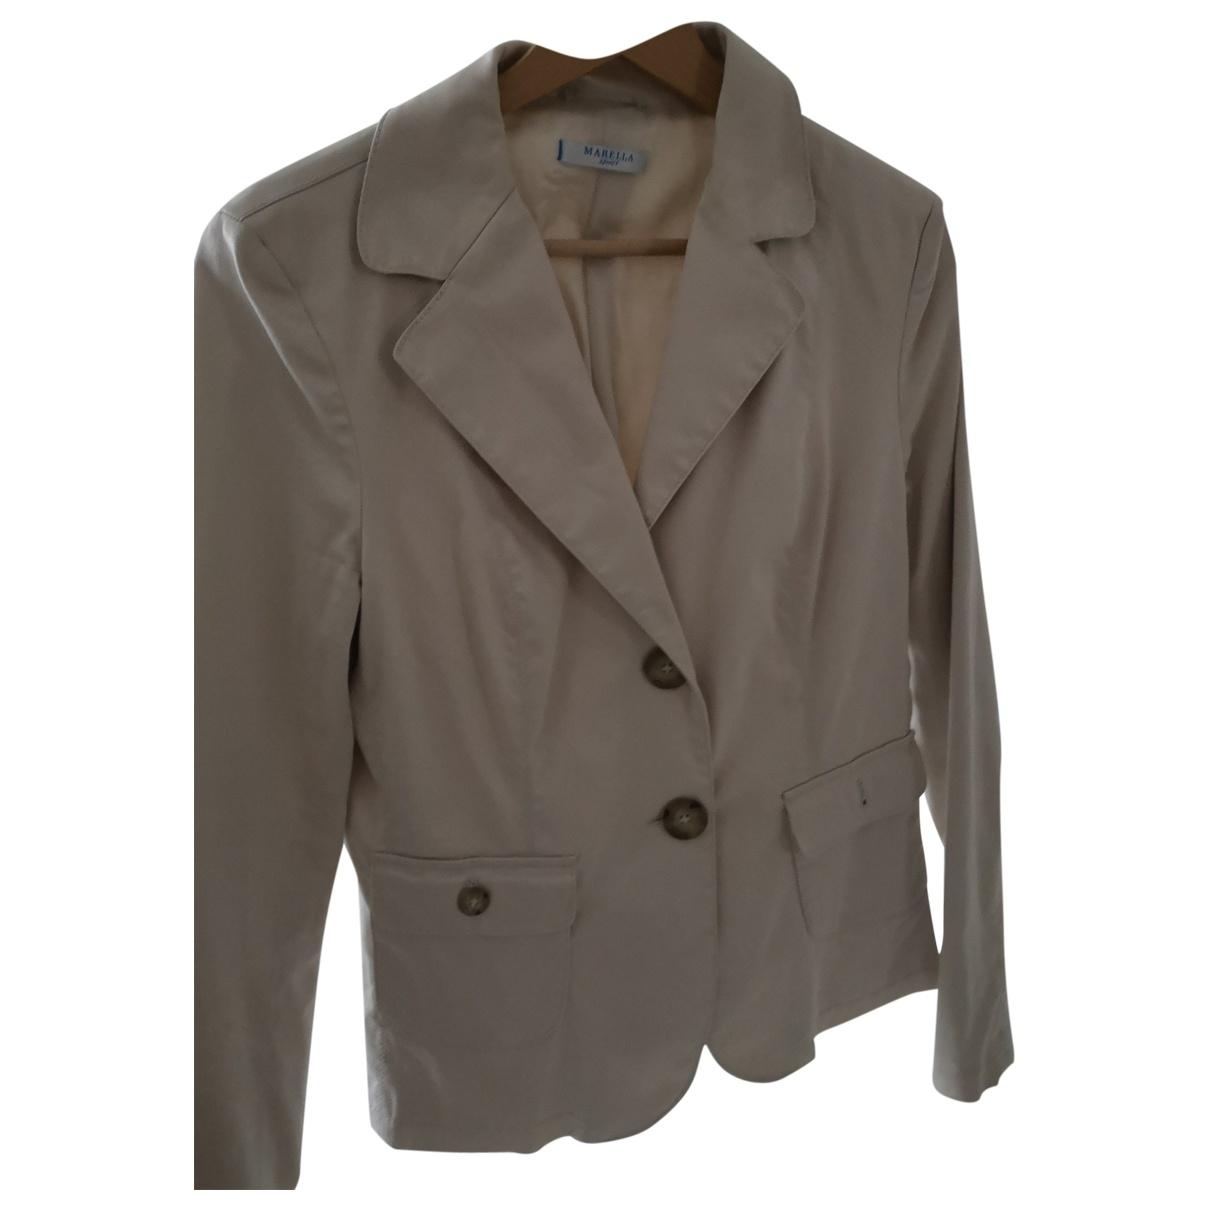 Marella \N Beige Denim - Jeans jacket for Women 44 FR